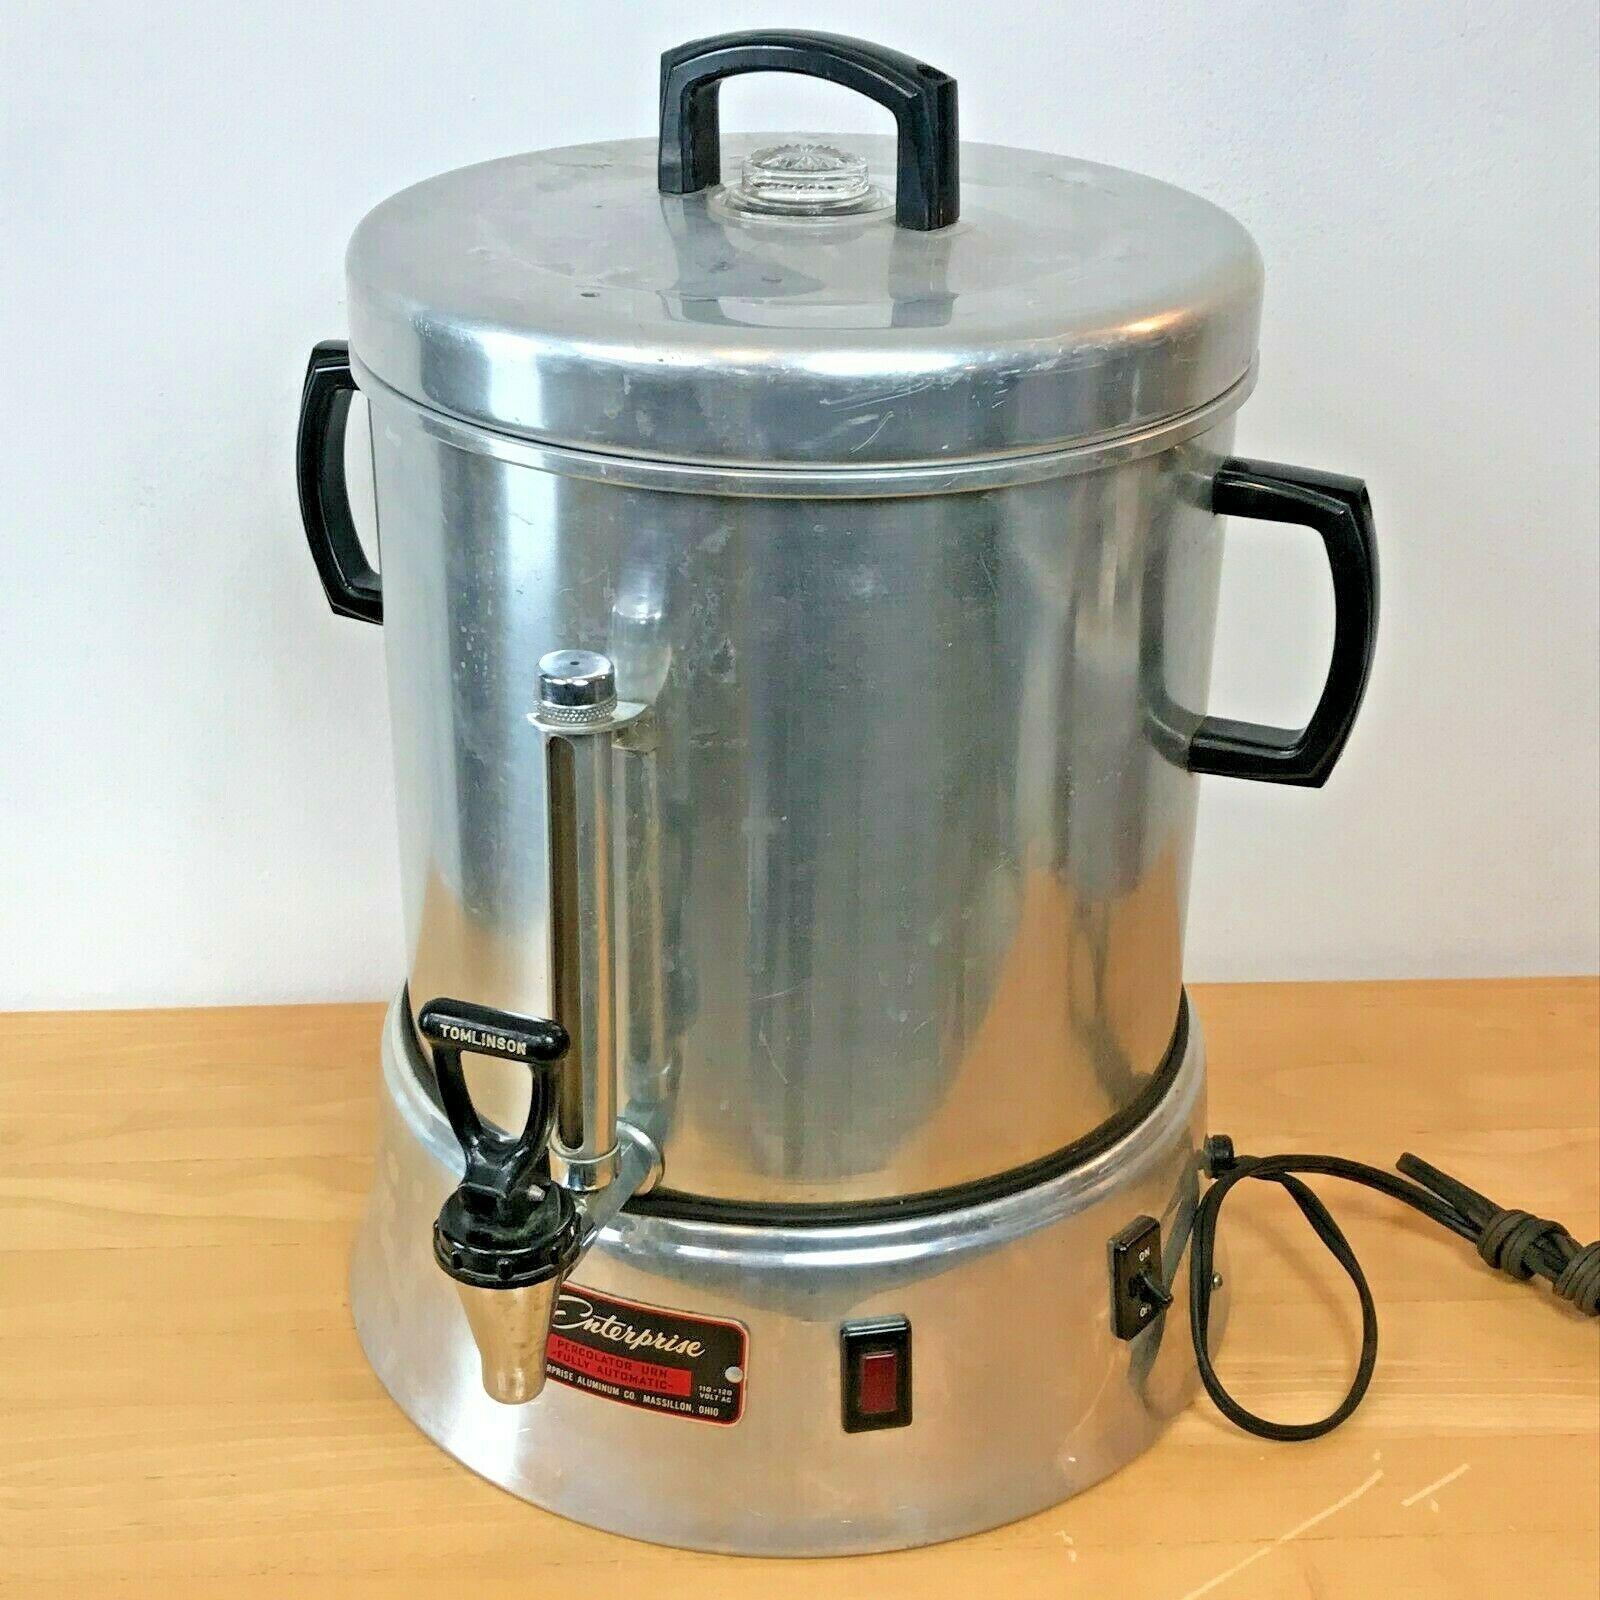 Vintage Enterprise Coffee Percolator 58 cup Urn Model AP48N WORKS Glass Knob LB